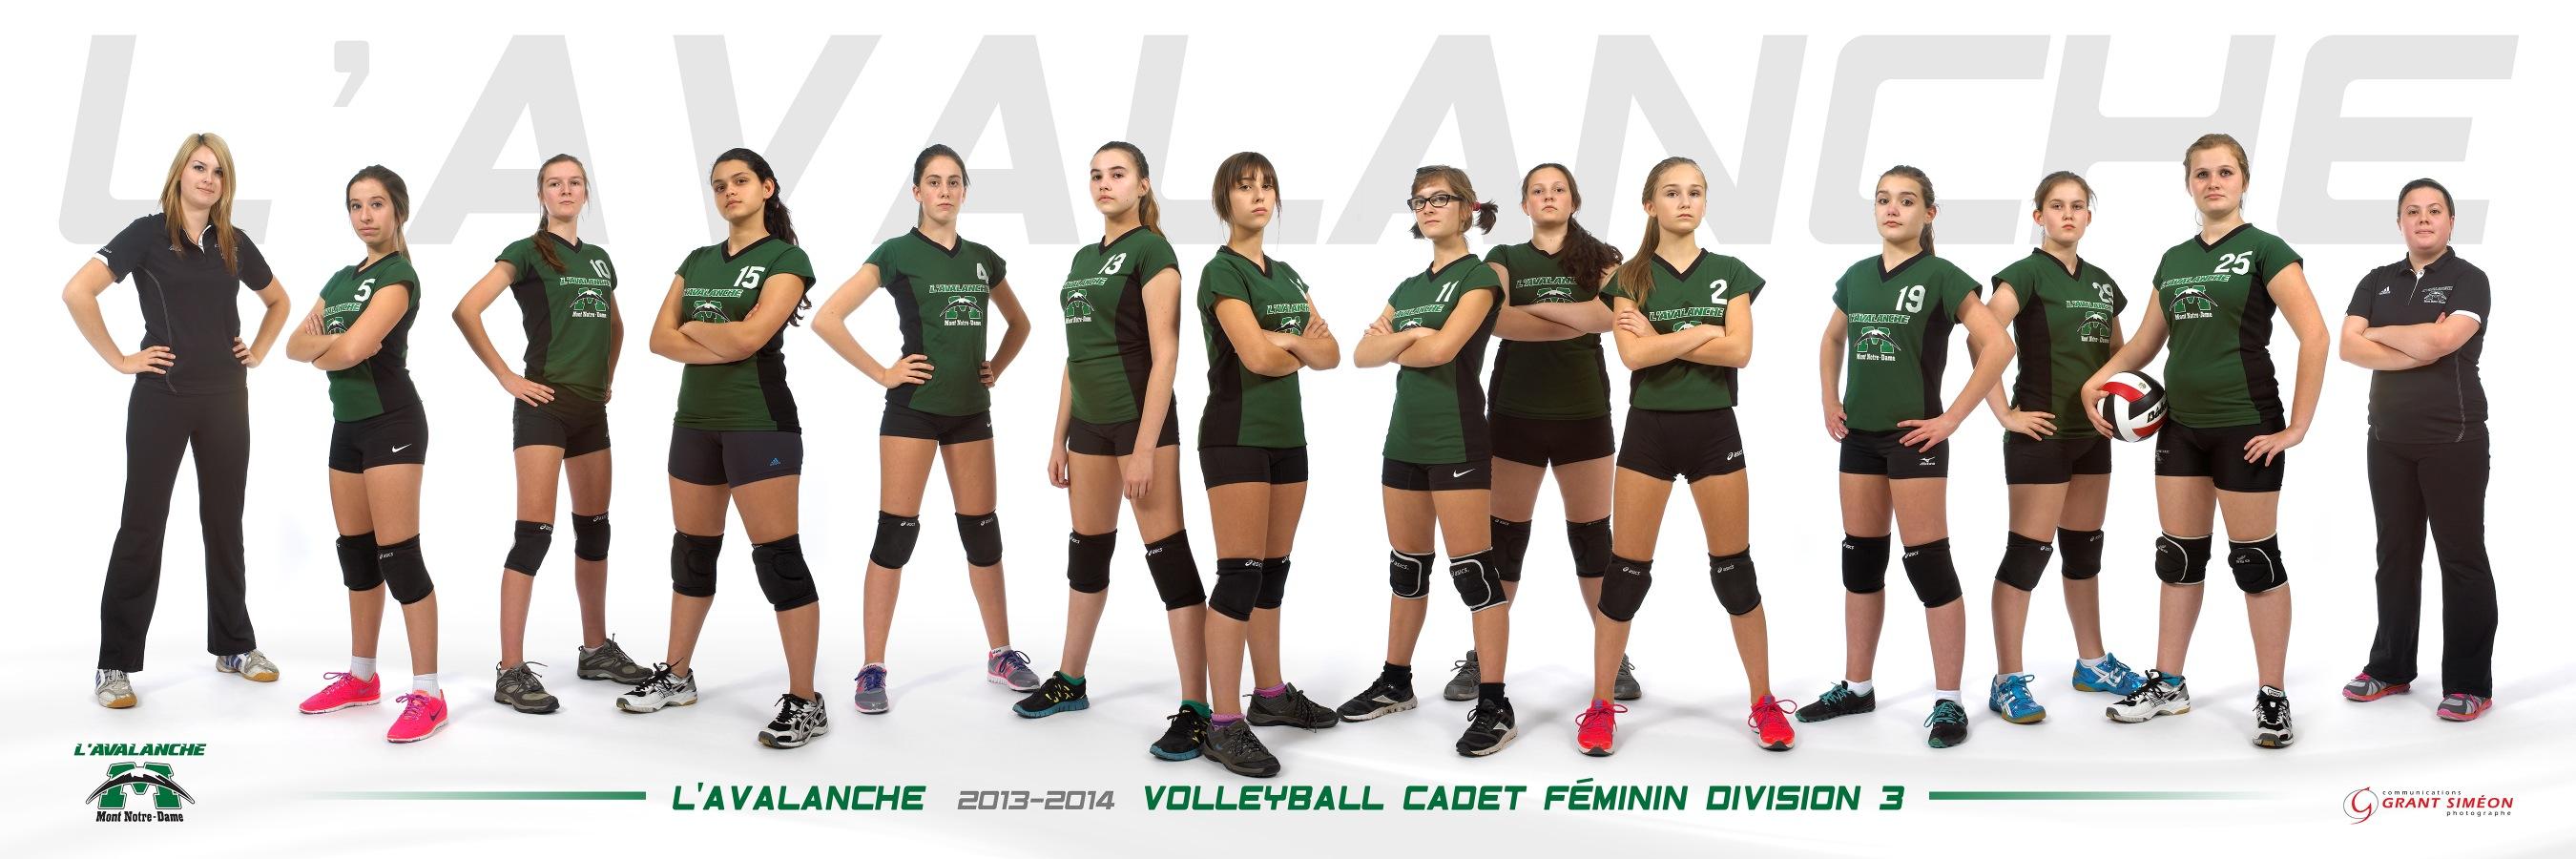 MND_volleyball-cadette-div-3-2013-2014